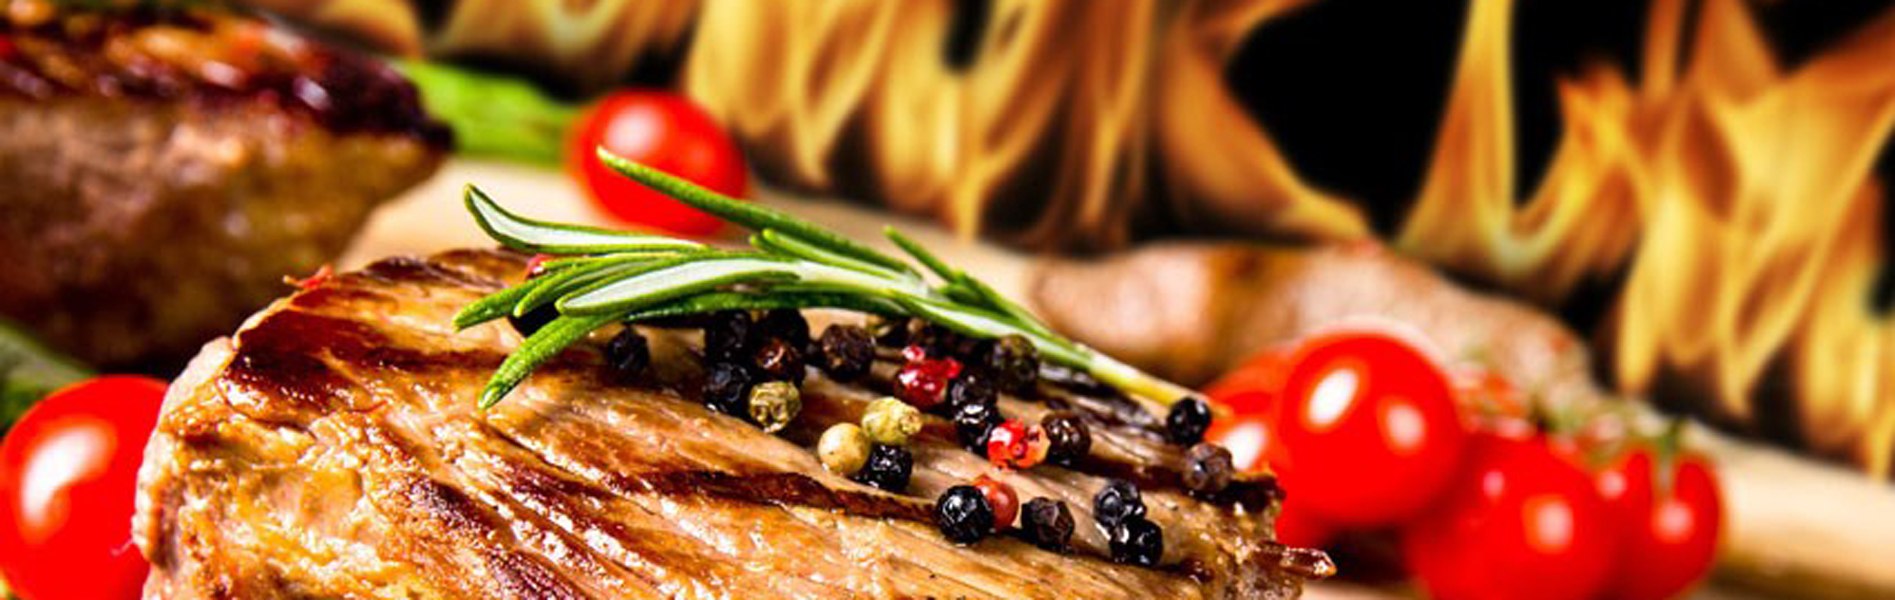 Unikorn Catering - Grillbuffet